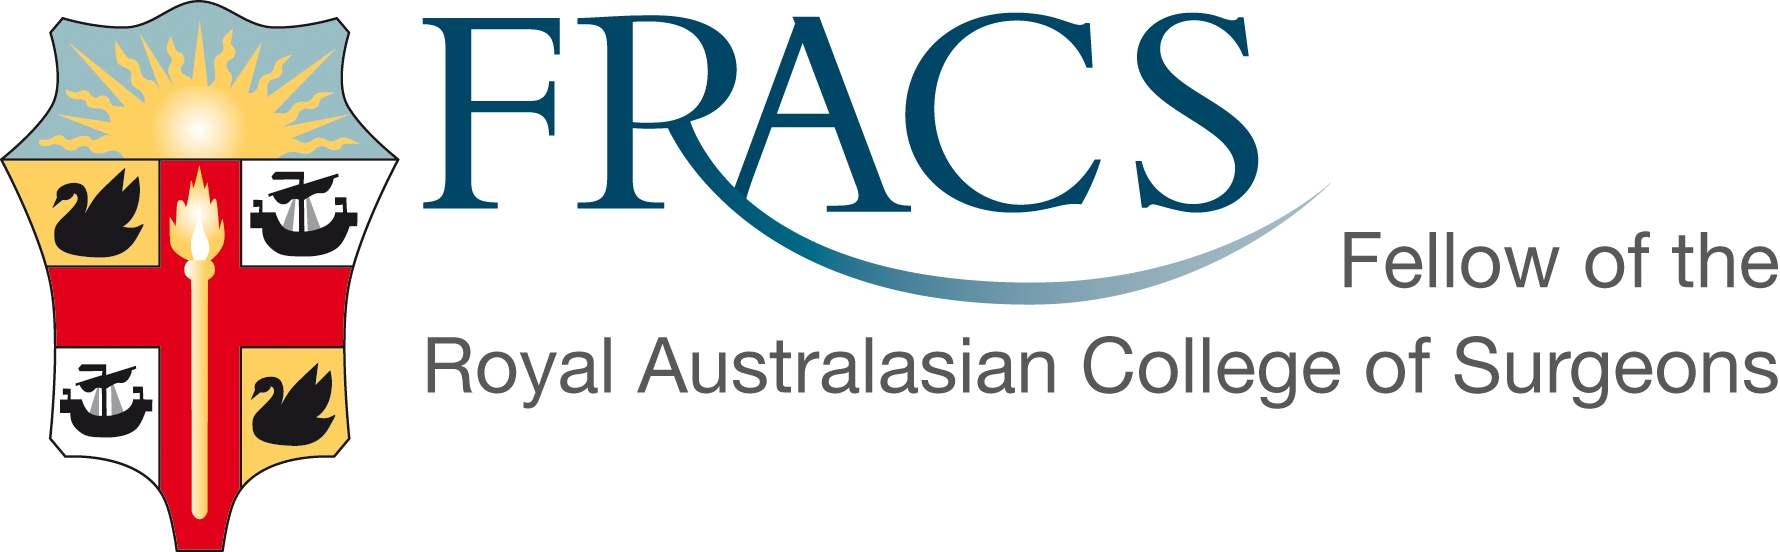 FRACS Logo_A RGB.jpg